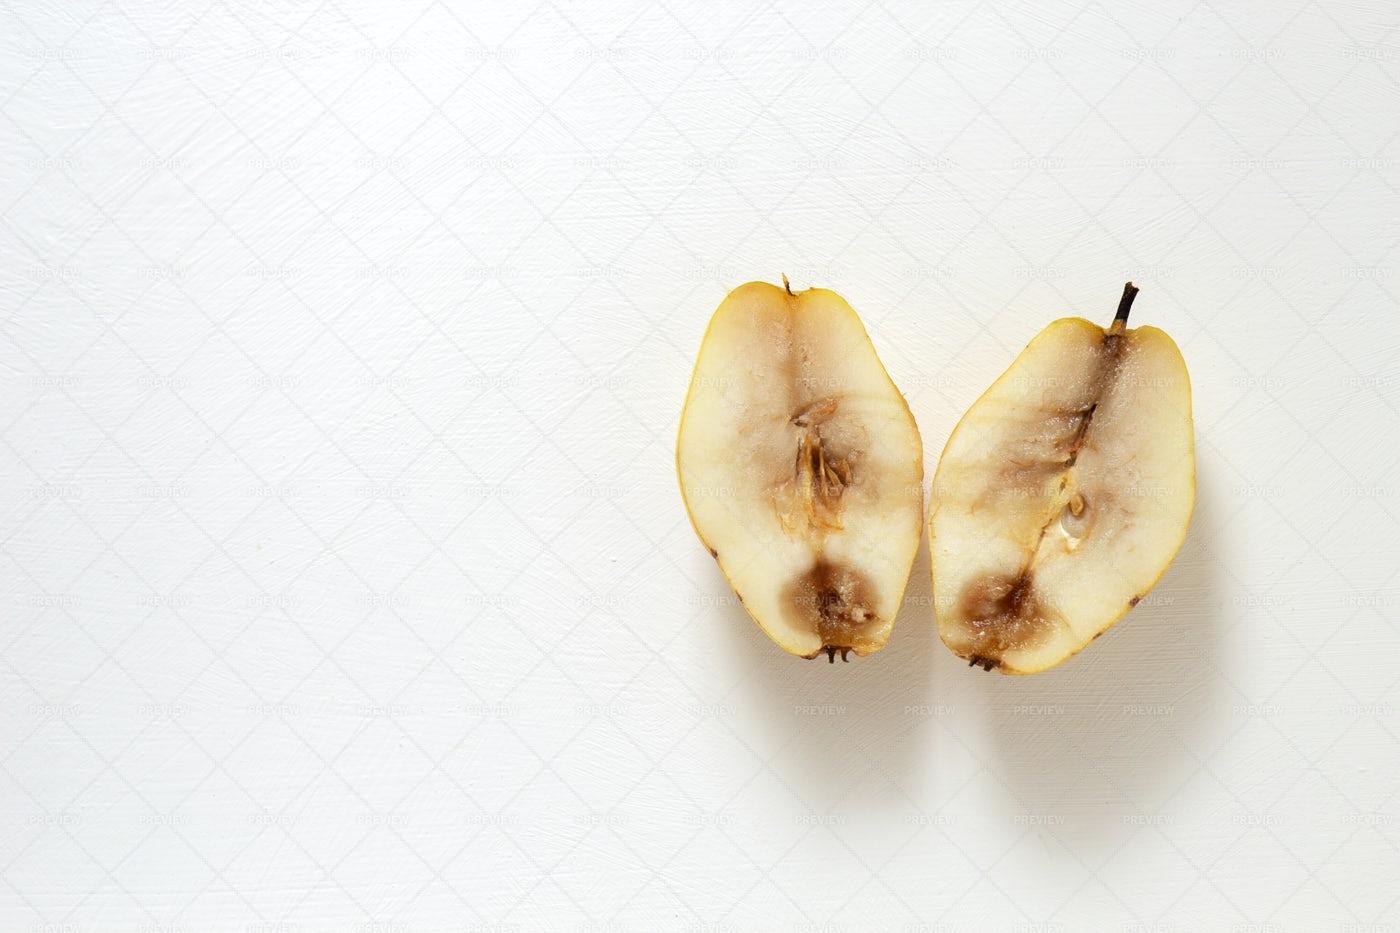 Spoiled Pear: Stock Photos